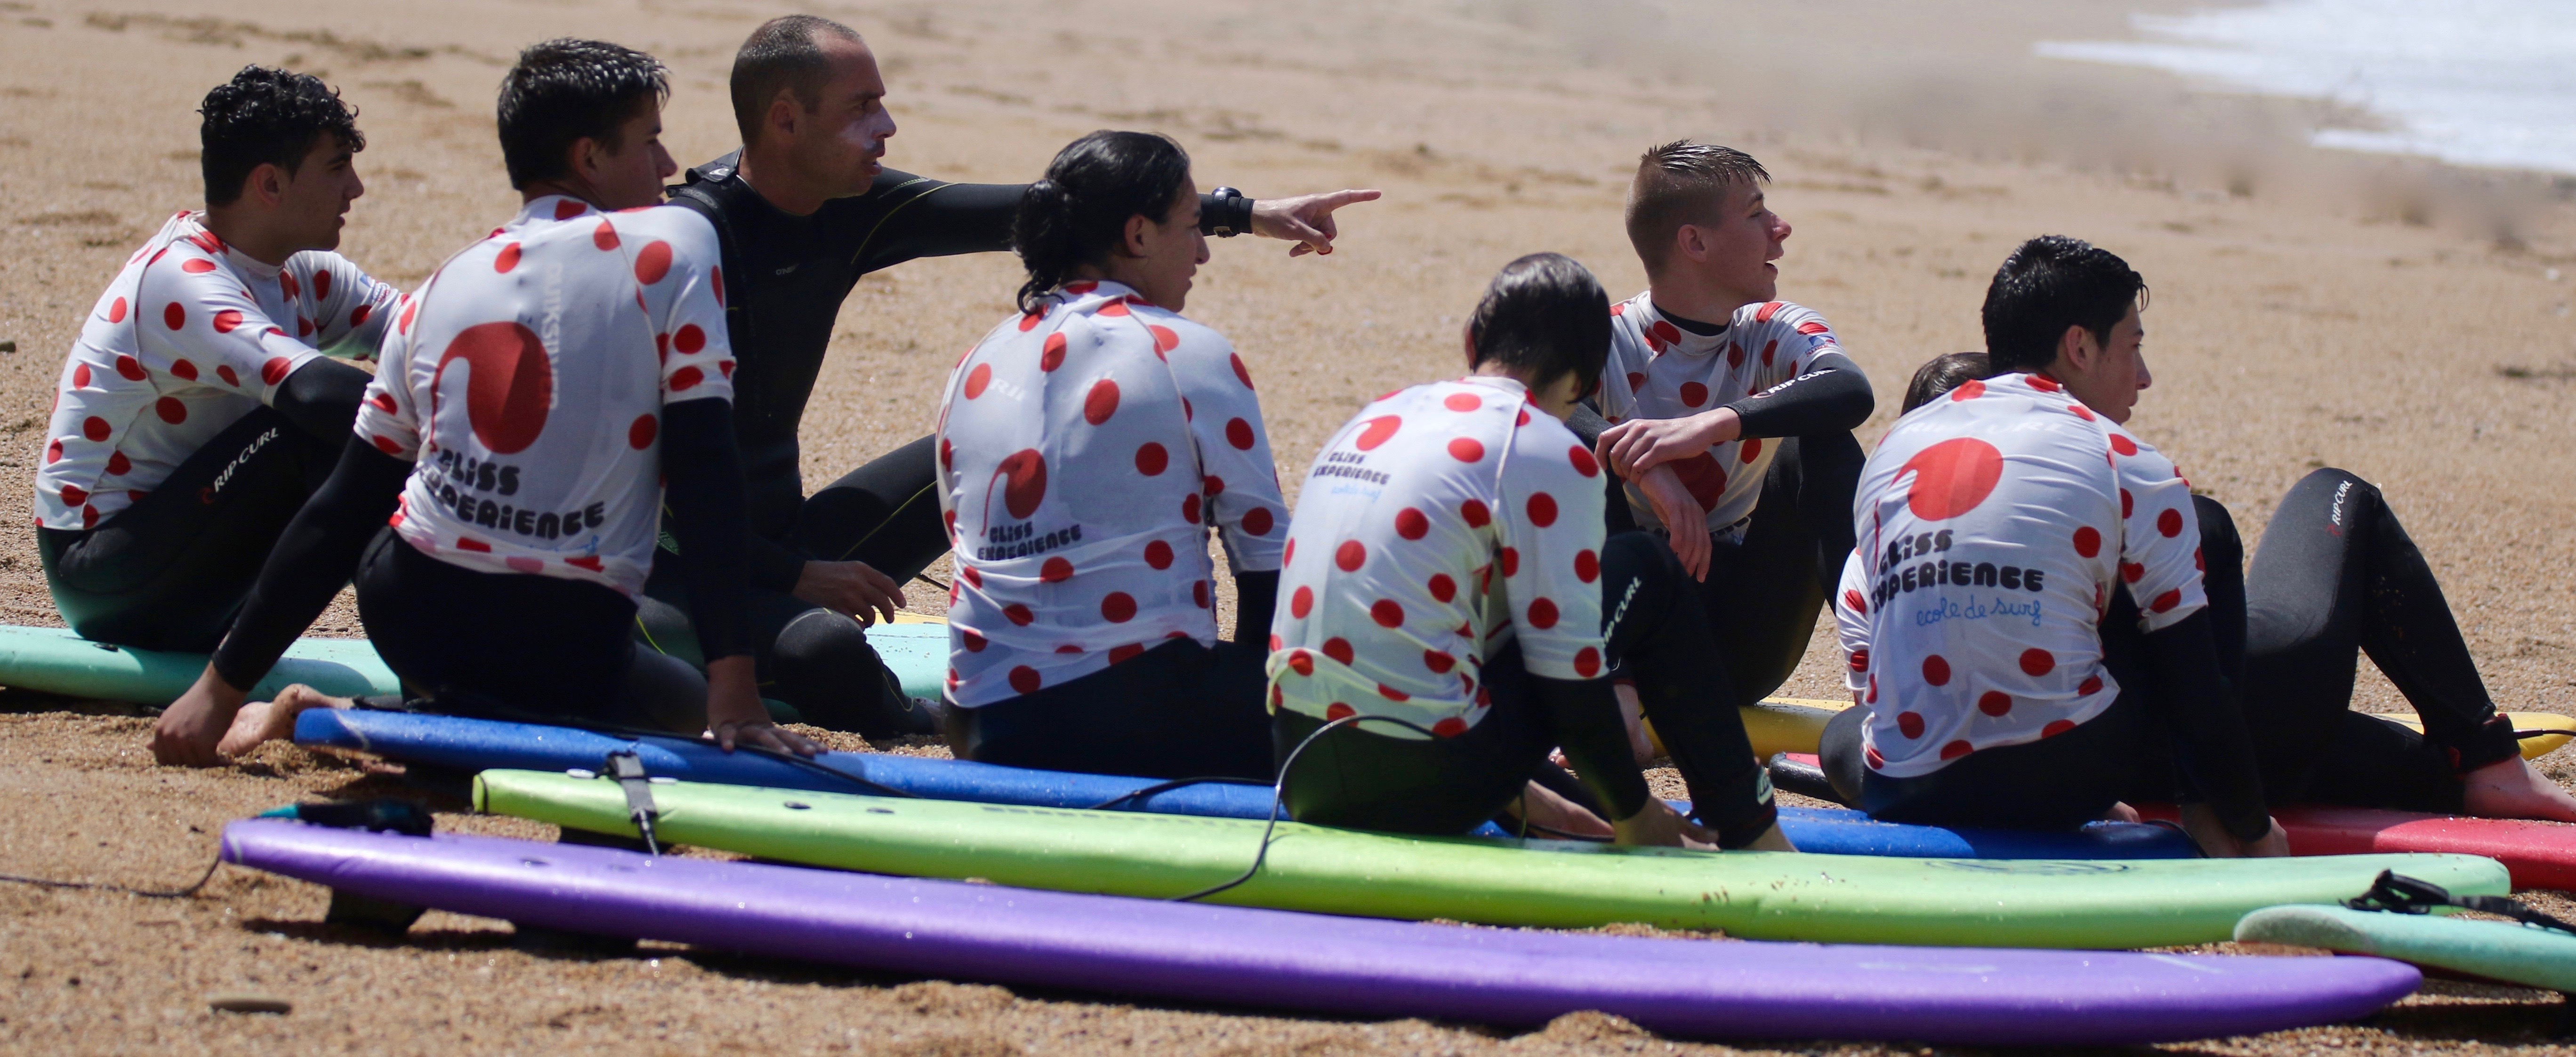 surfcamp ados biarritz